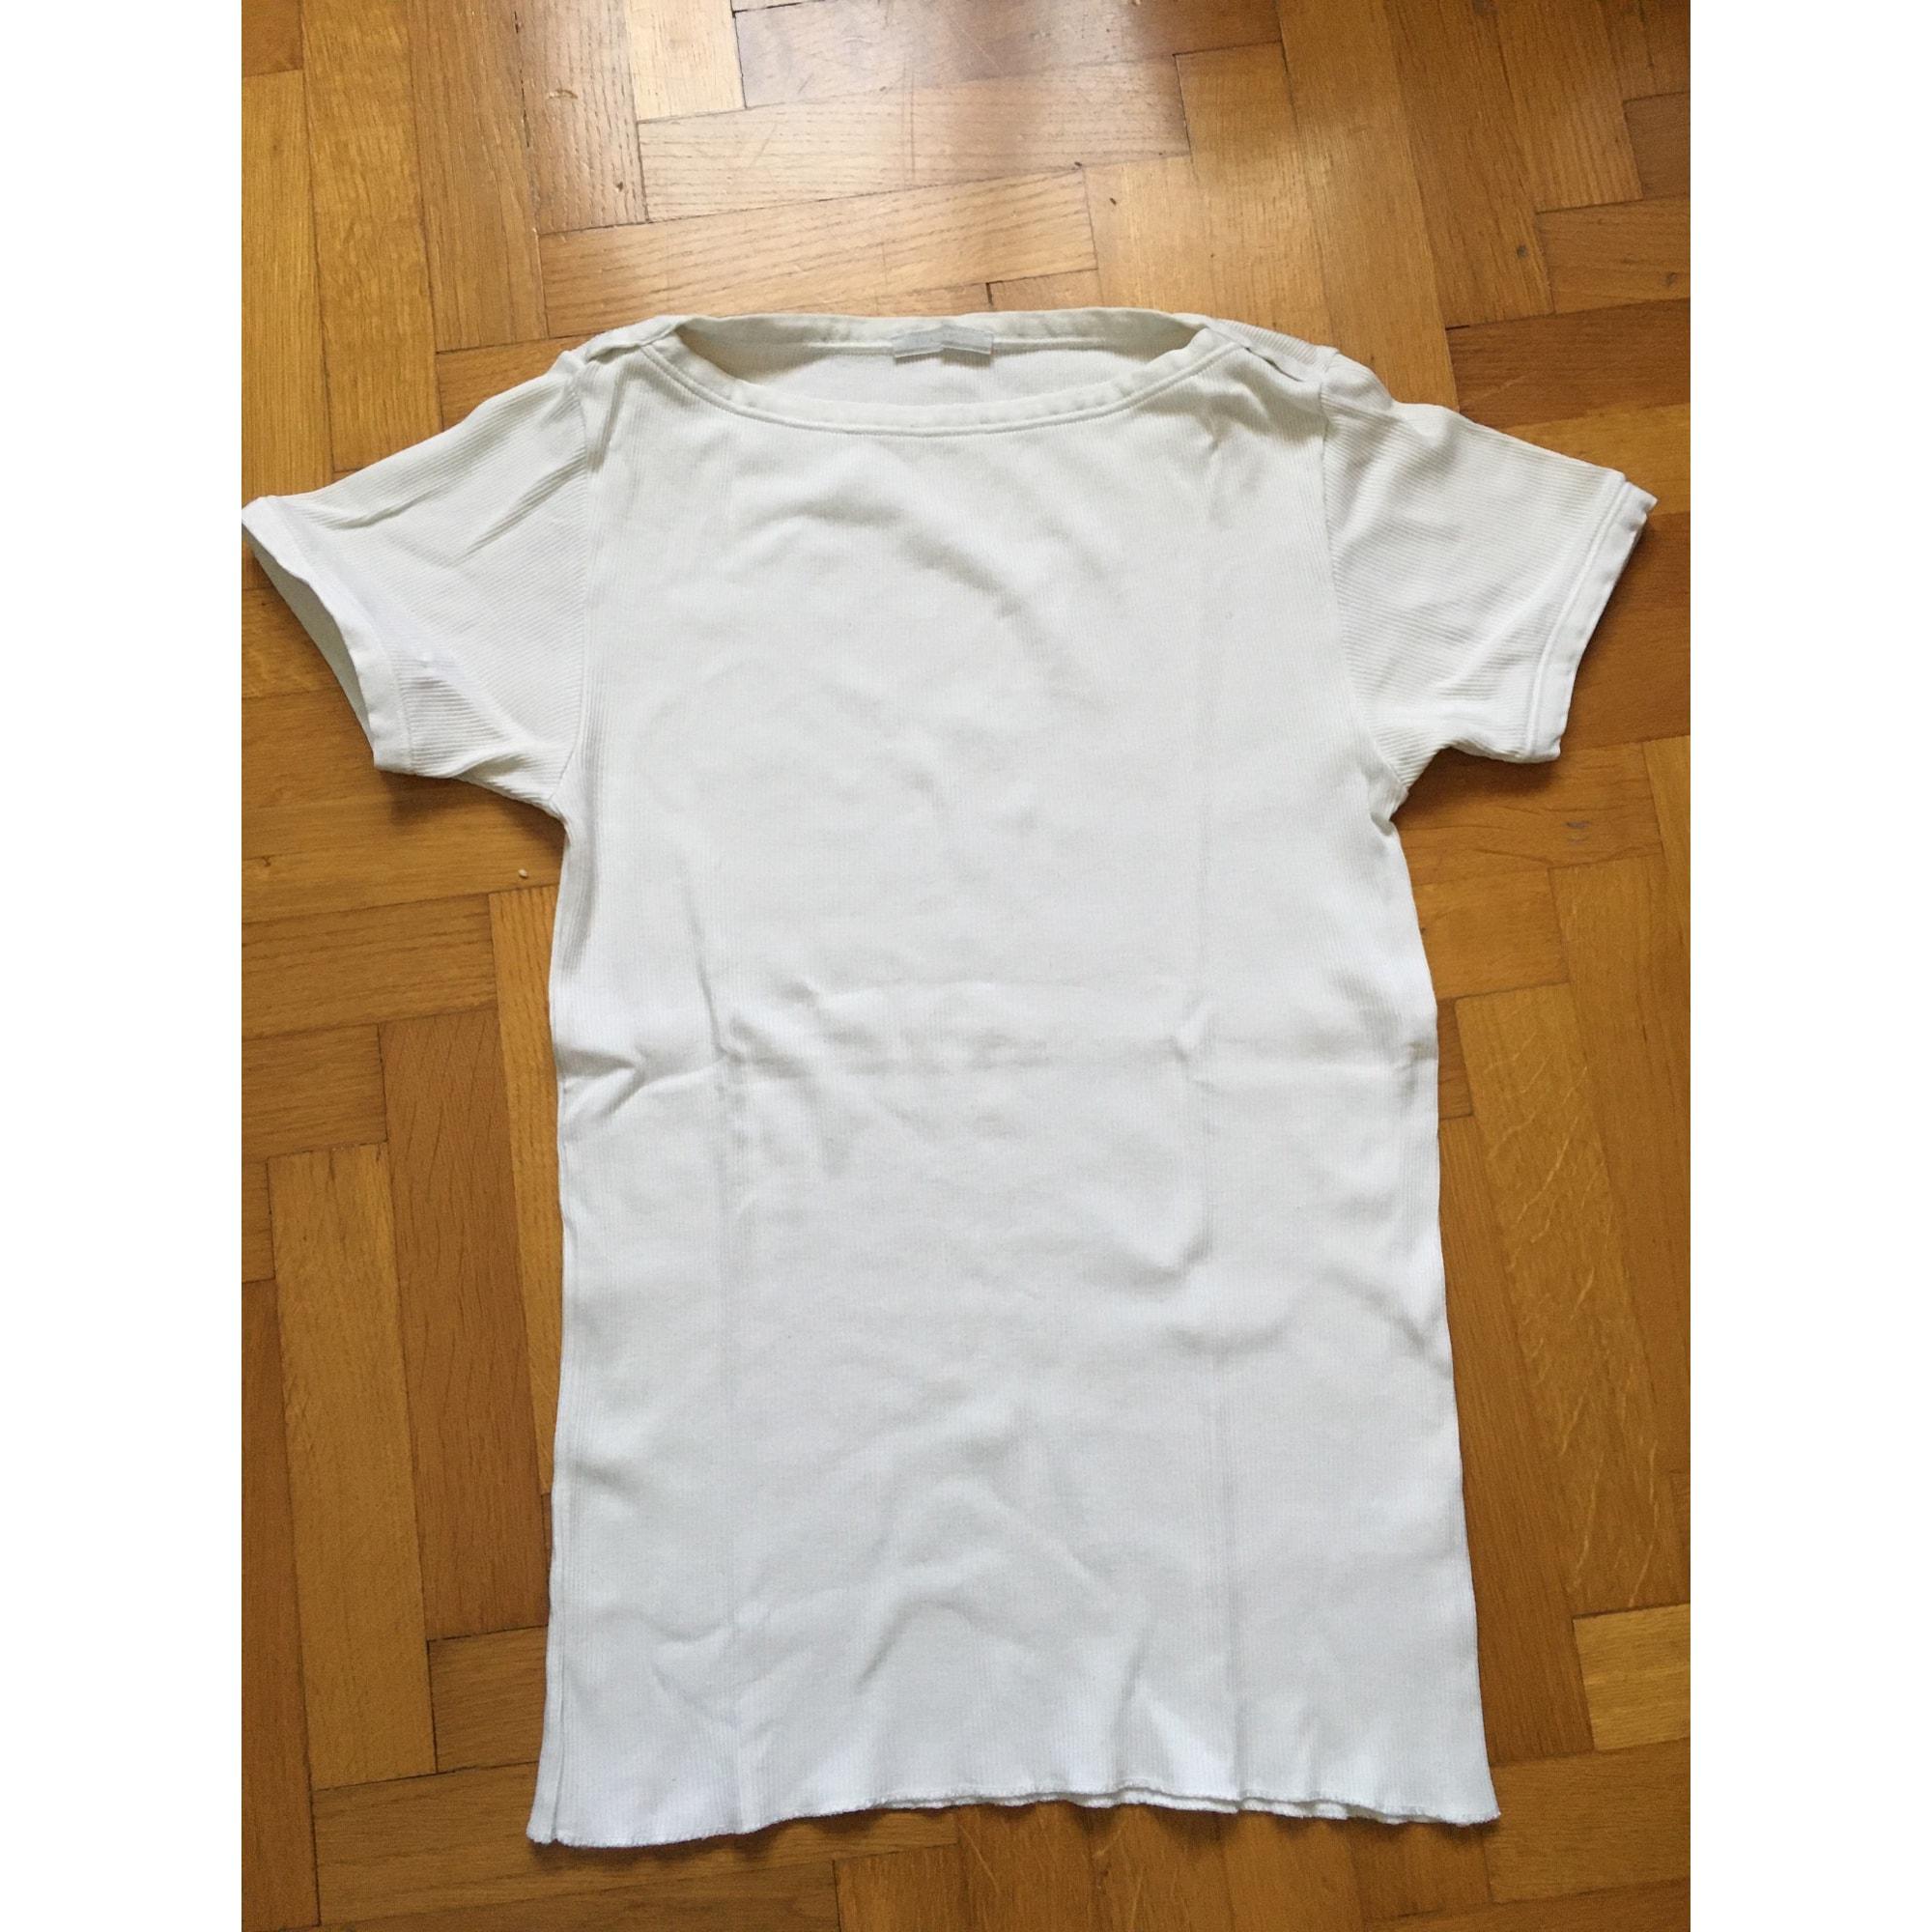 Tee-shirt PRADA Blanc, blanc cassé, écru